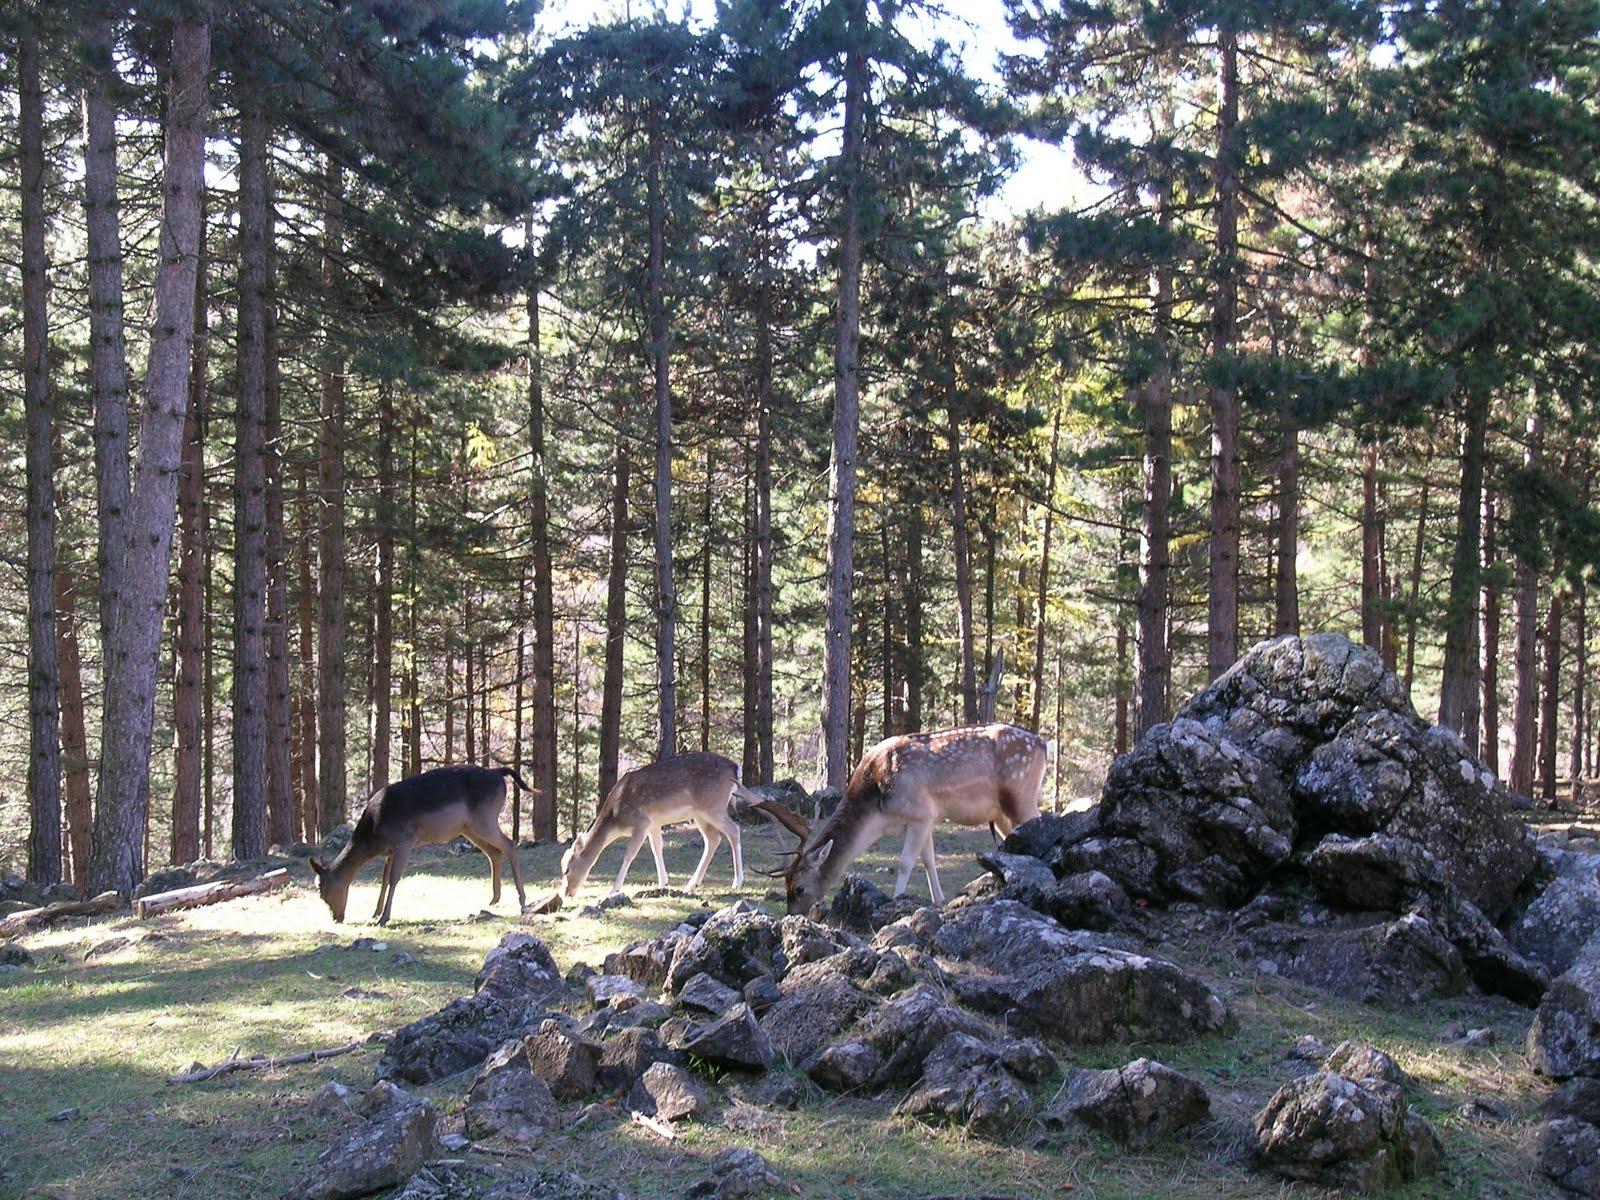 Giardino Pietra Corva : Romagnese domenica terzo appuntamento al giardino botanico alpino